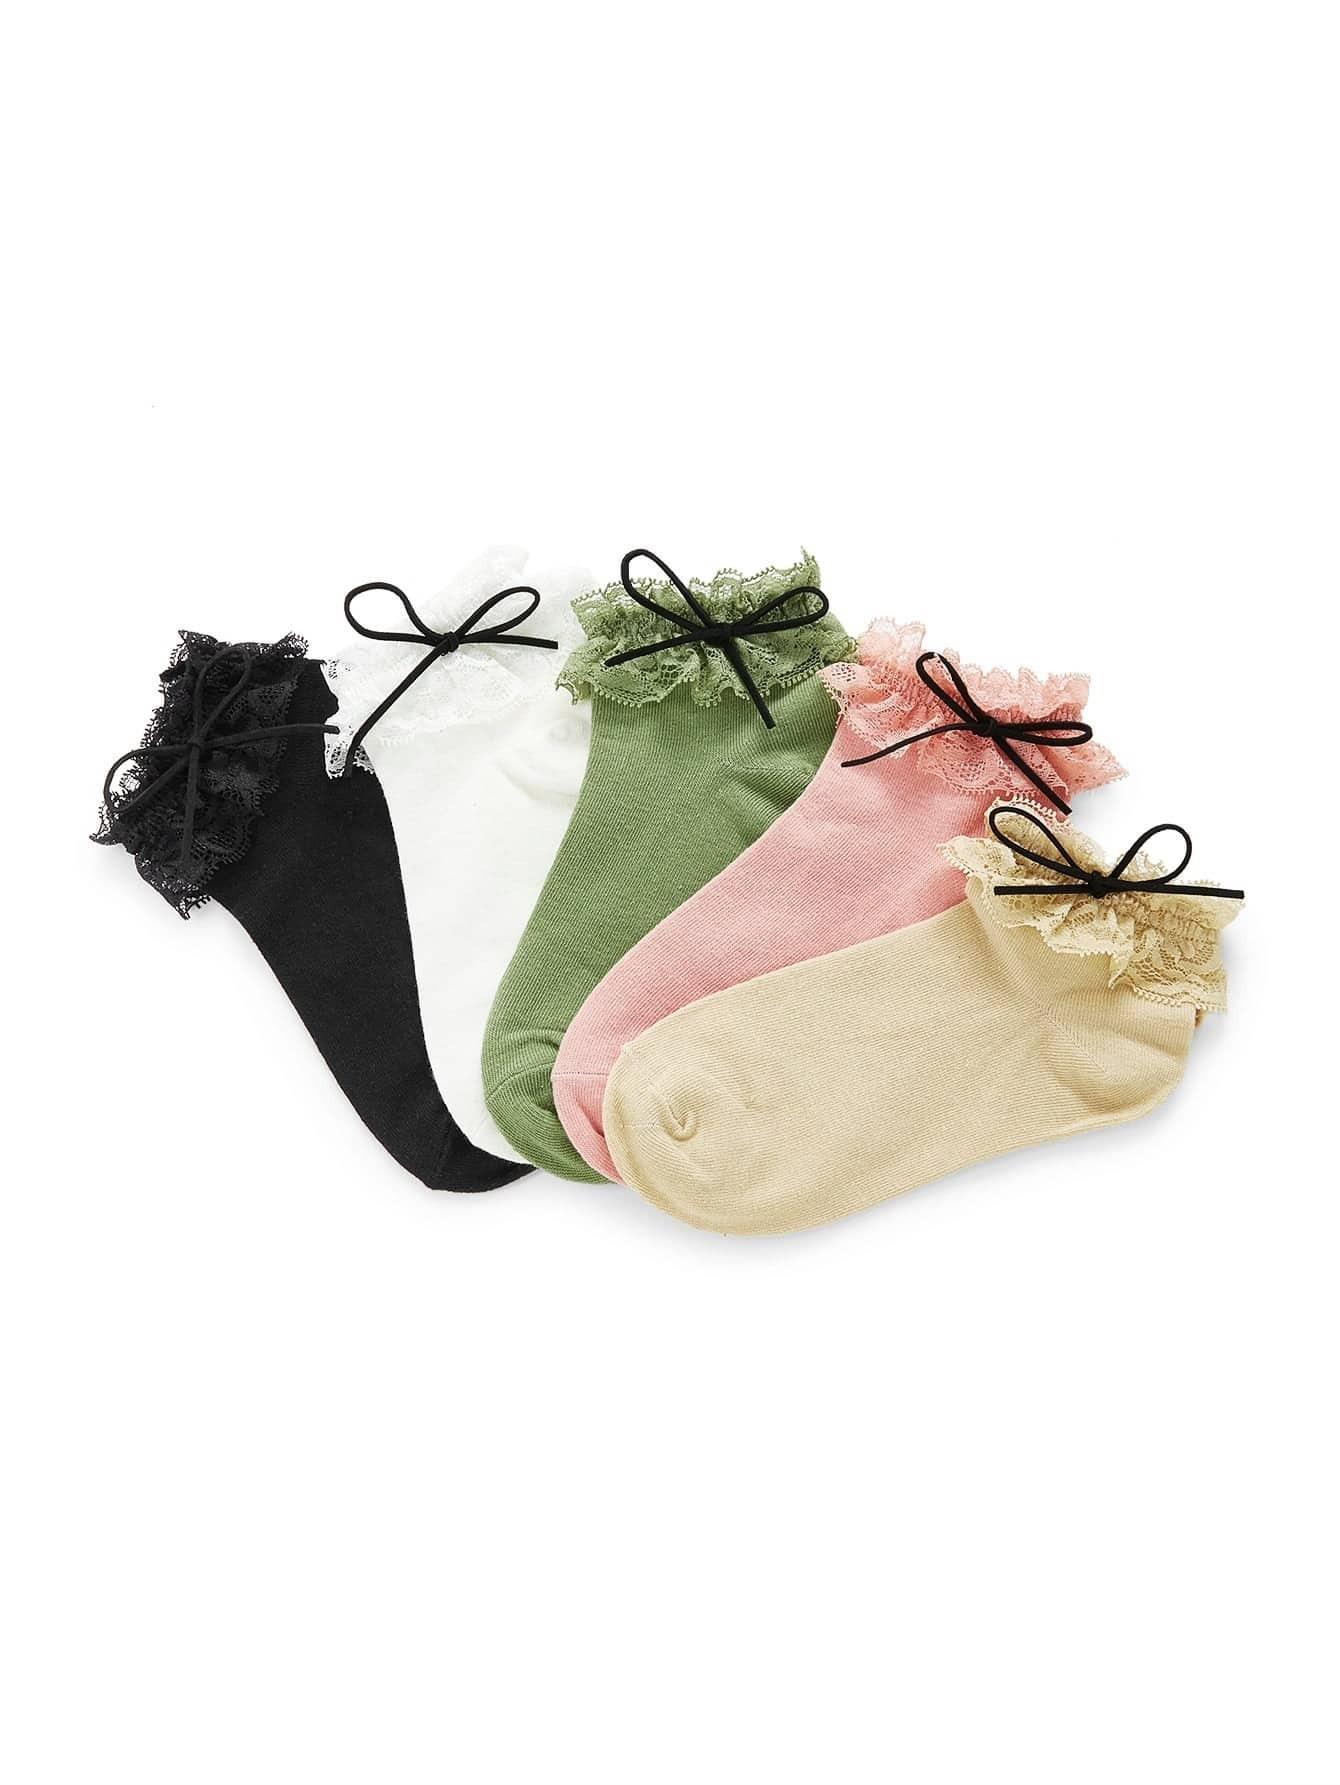 Lace Trim Bow Tie Socks 5pairs женские чулки 1 5pairs